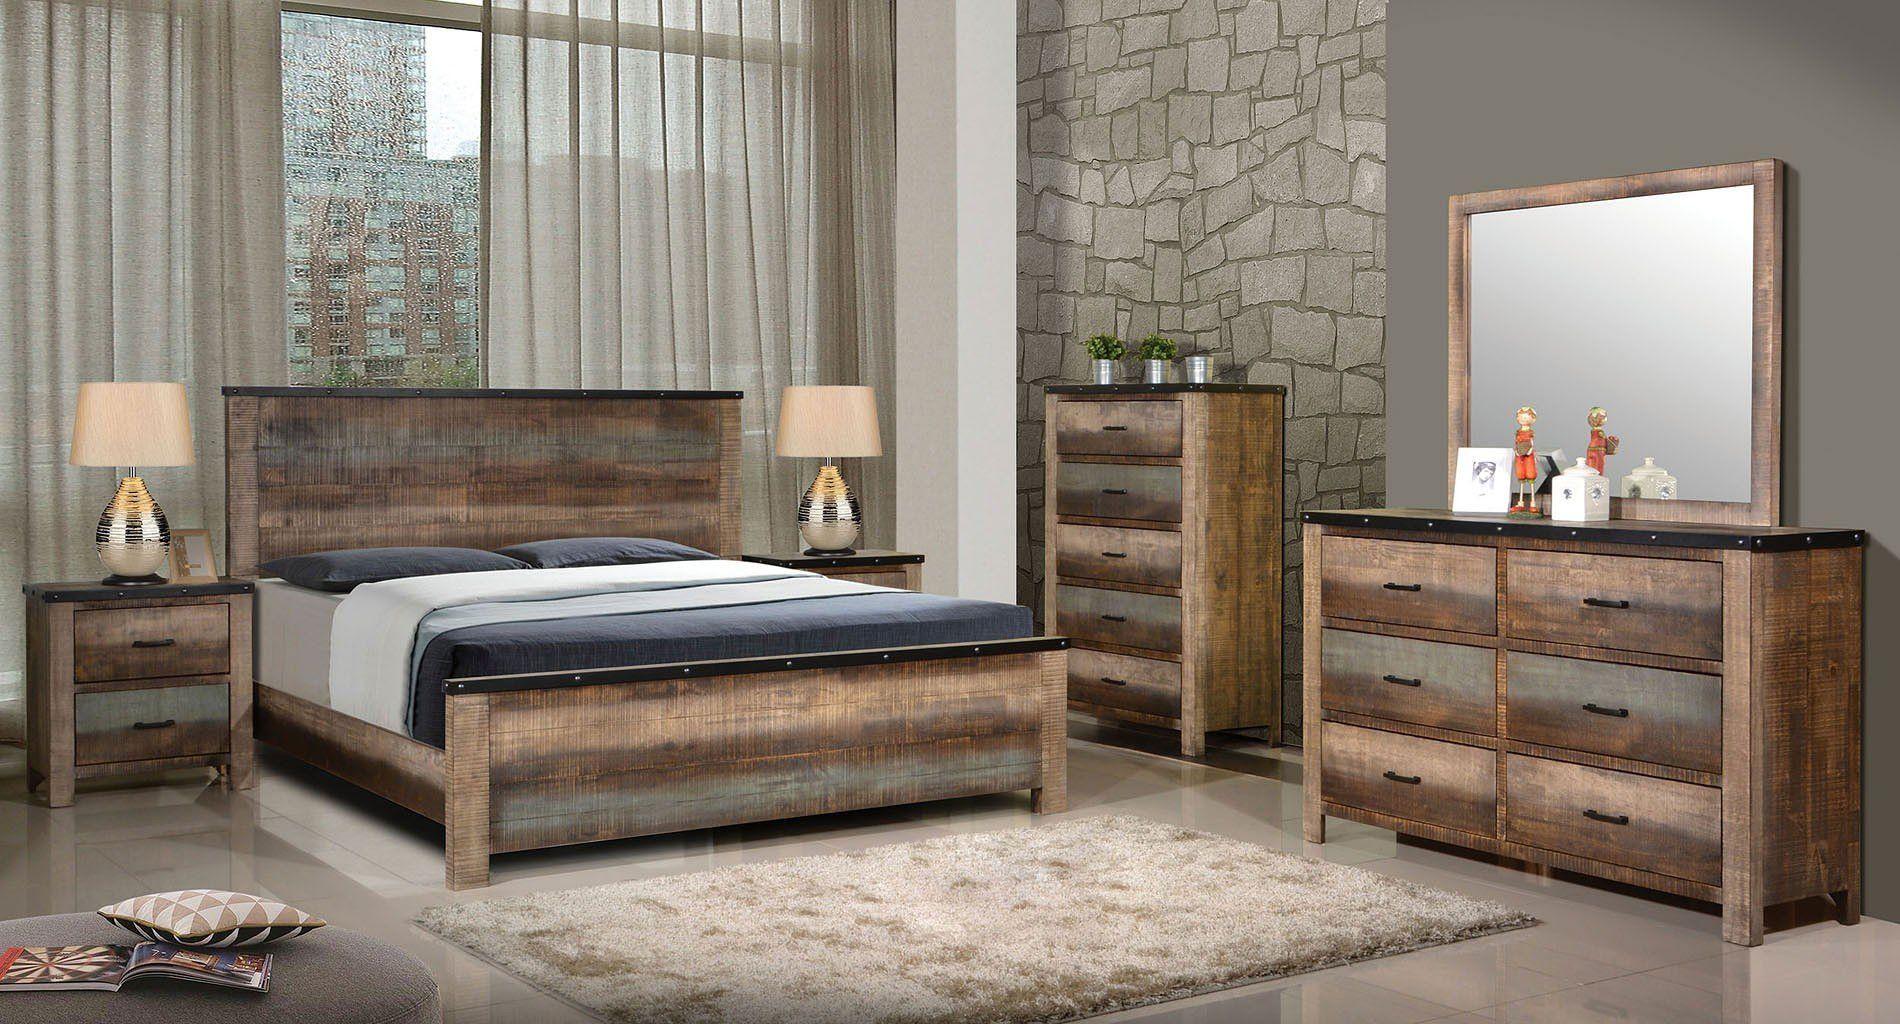 Sembene Panel Bedroom Set in 2020 Bedroom sets, King